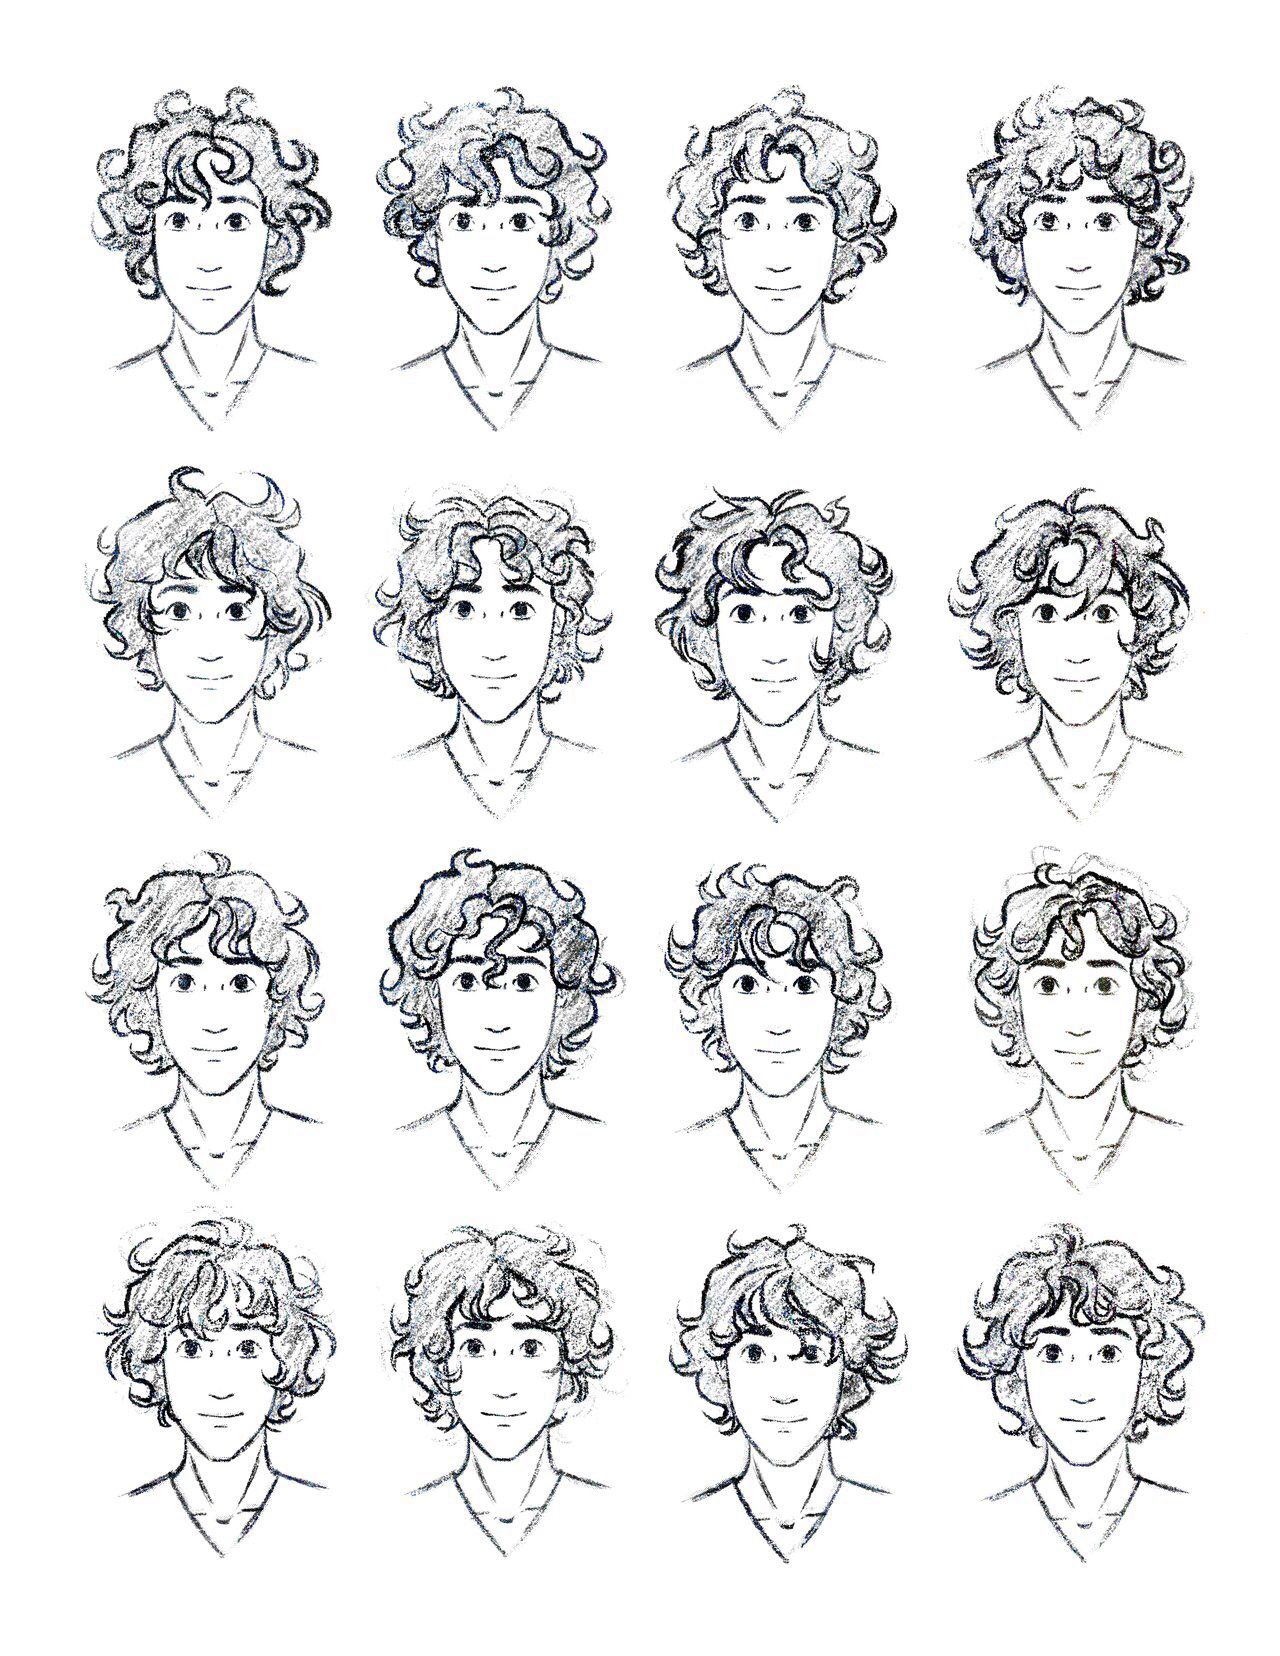 Do you need photos to draw Anime?